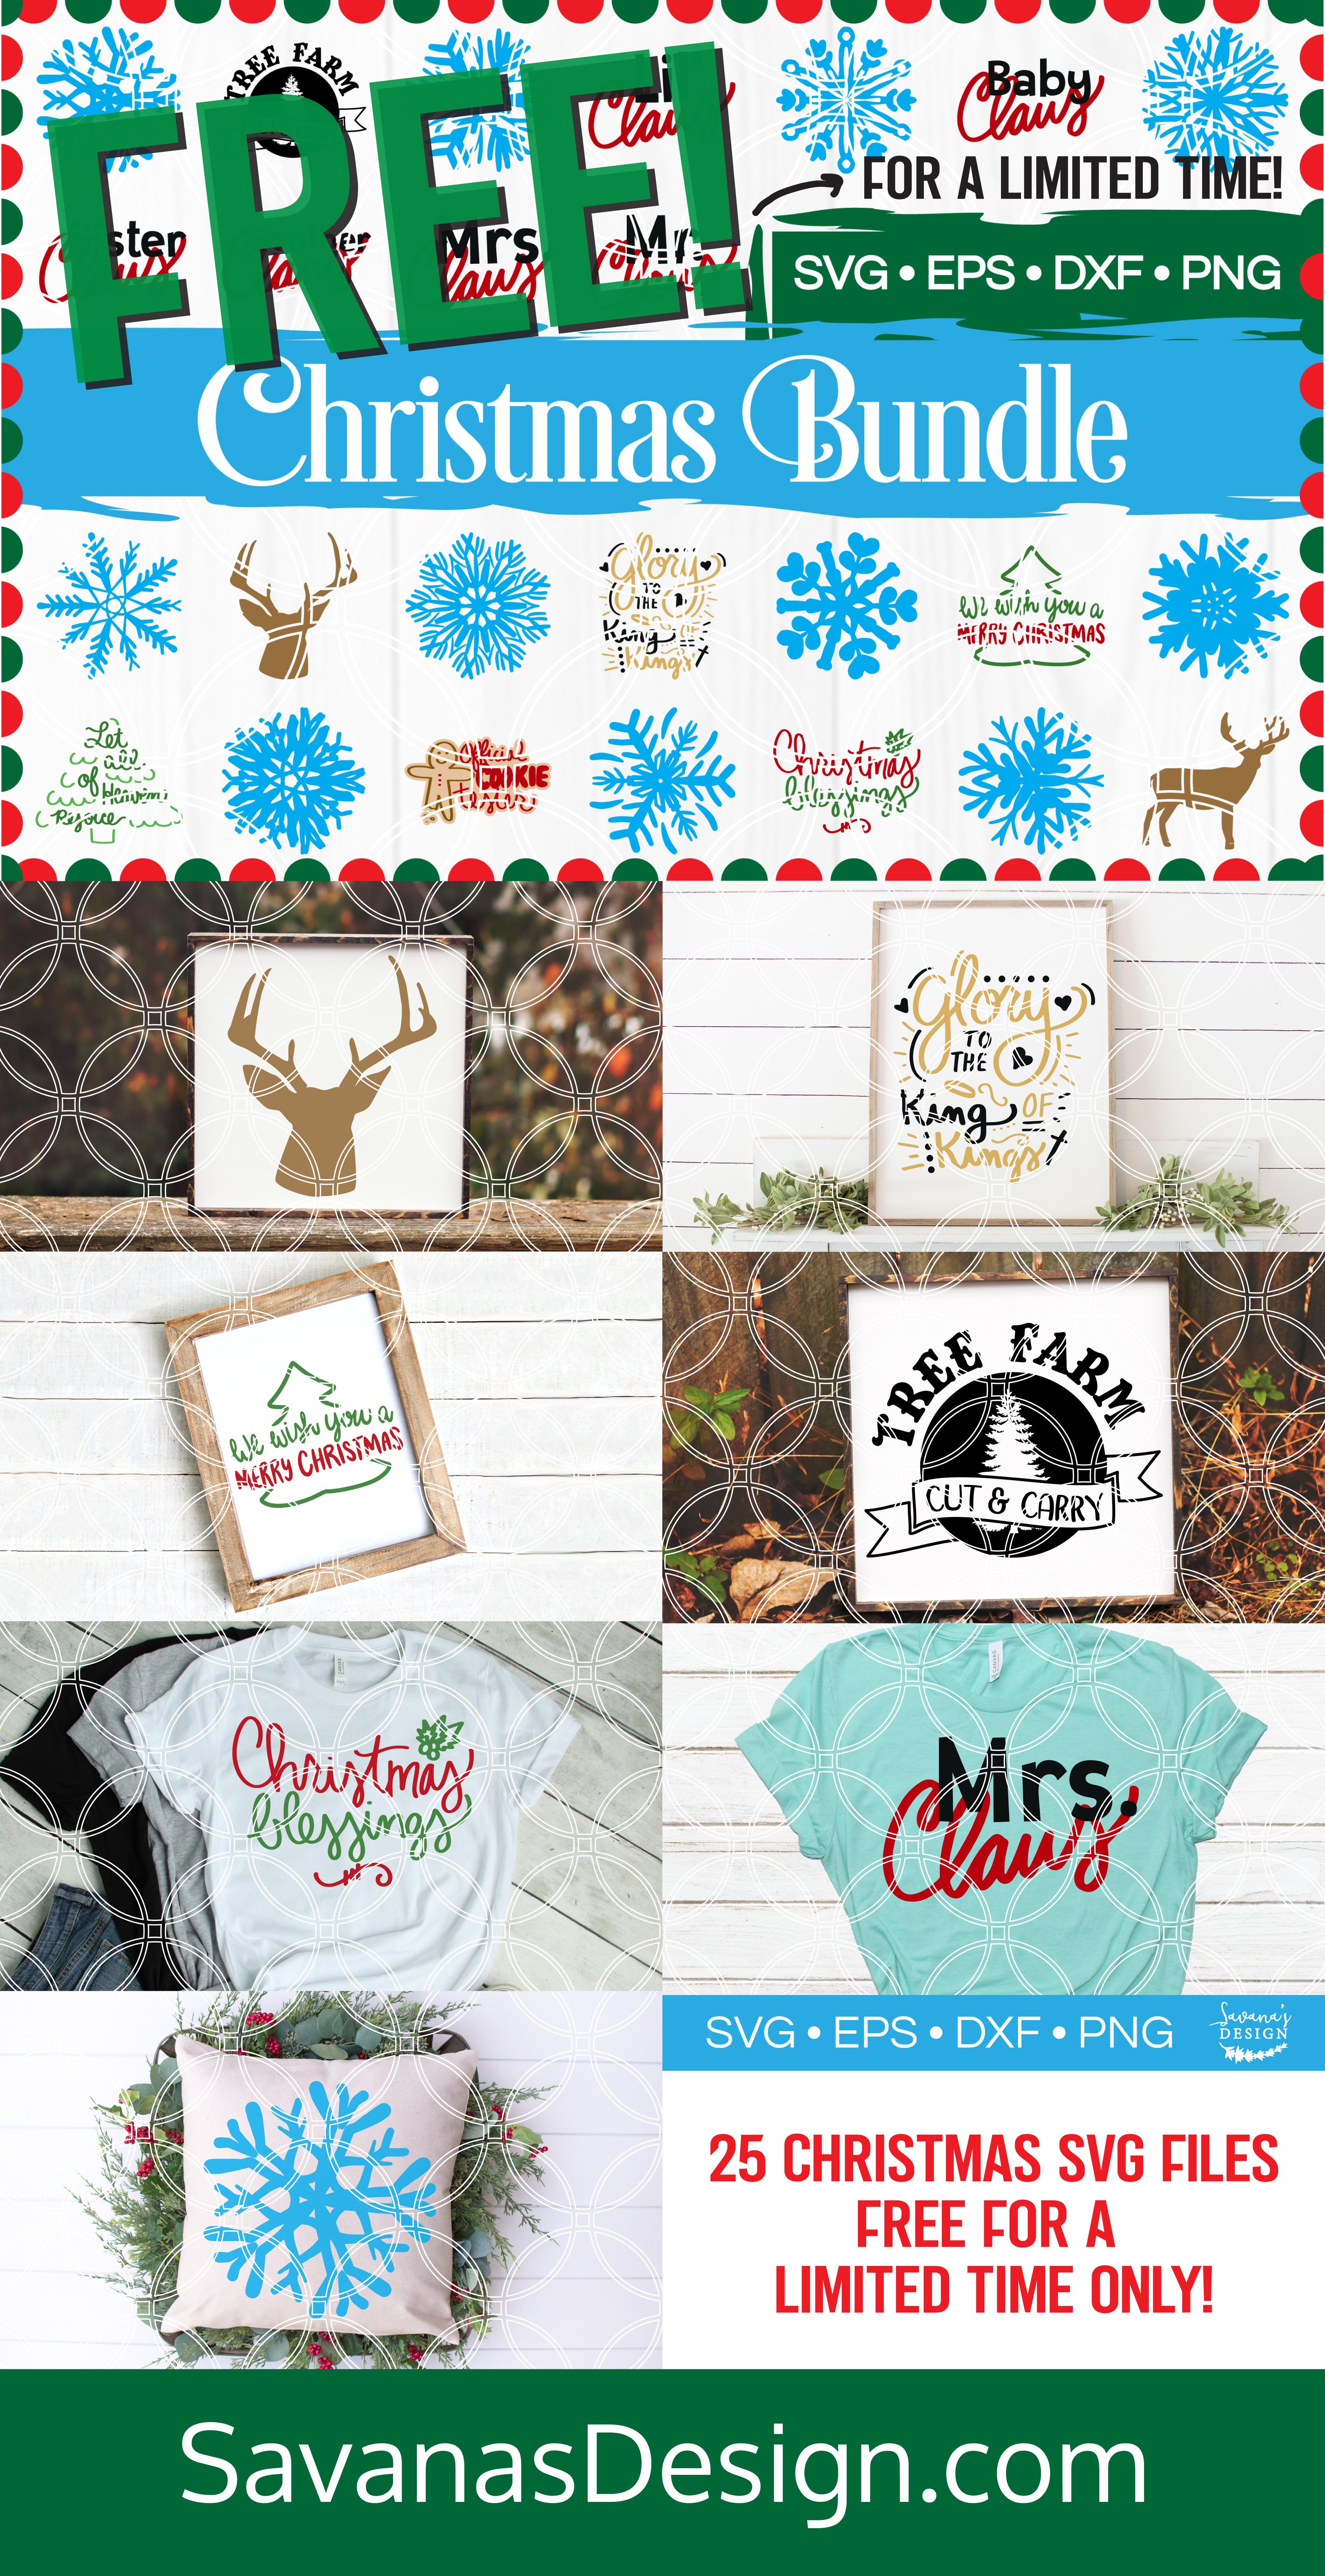 Christmas SVG Bundle Pinterest